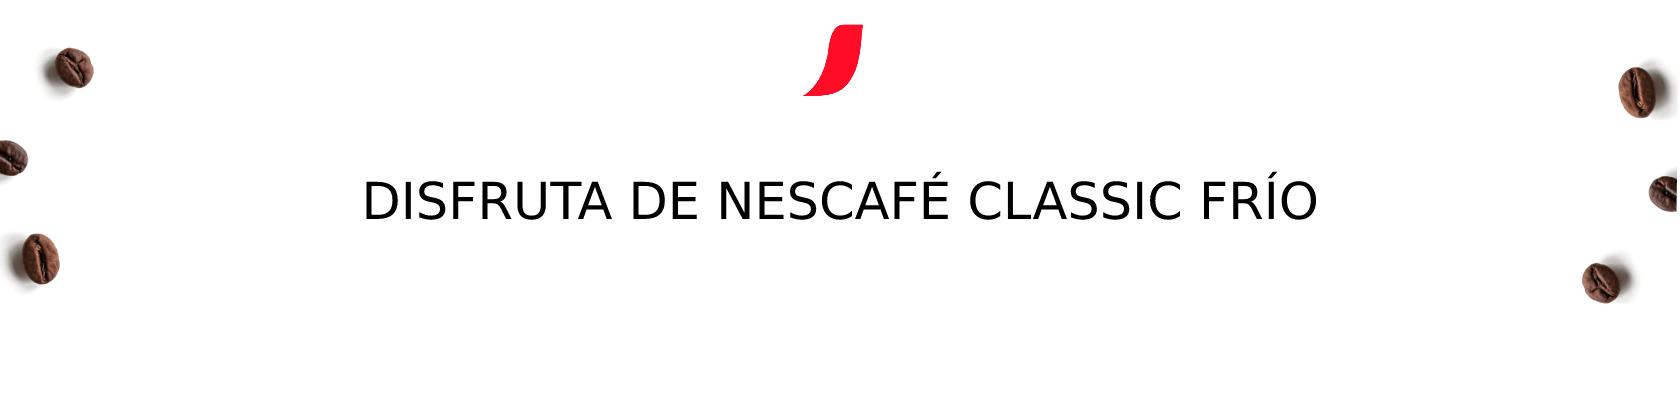 DISFRUTA DE NESCAFÉ CLASSIC FRÍO